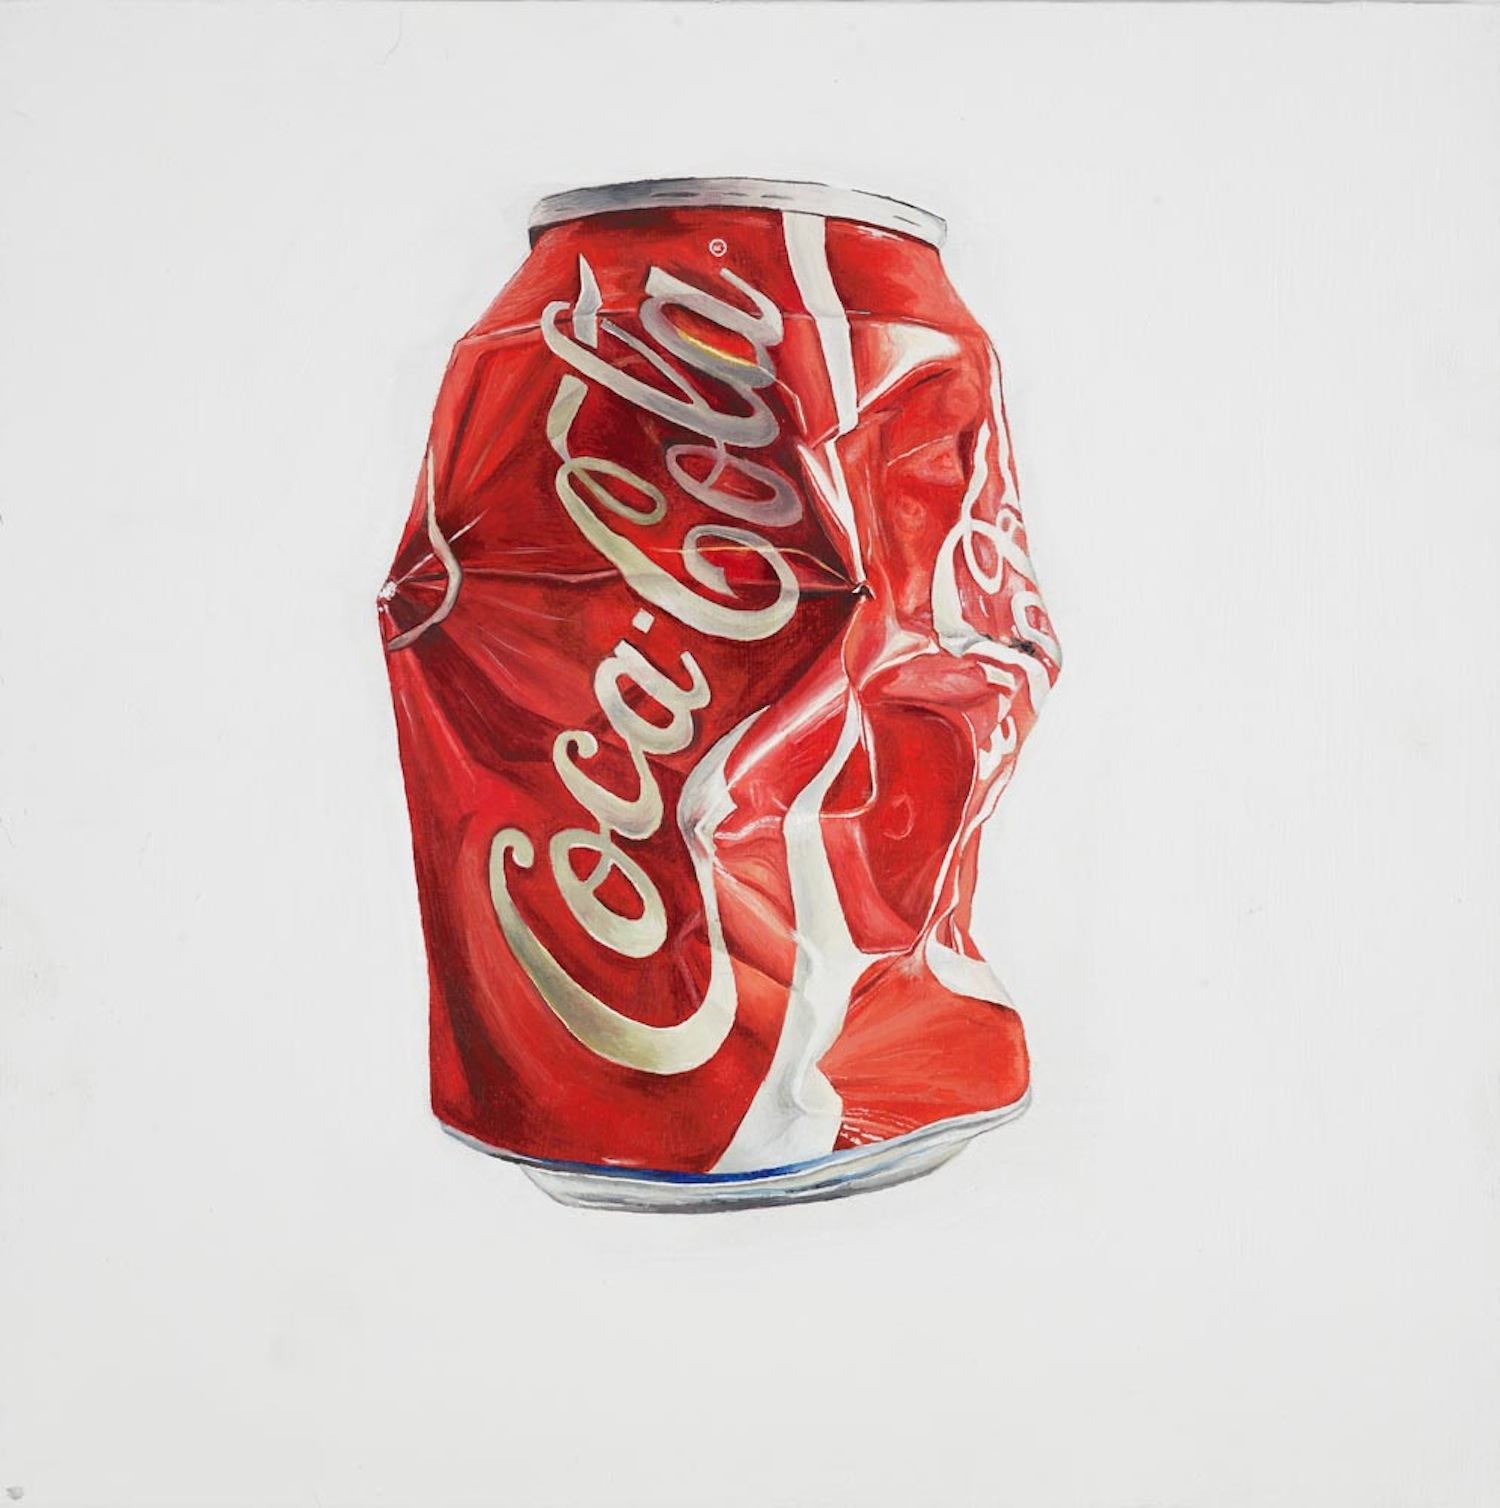 Crushed Coke